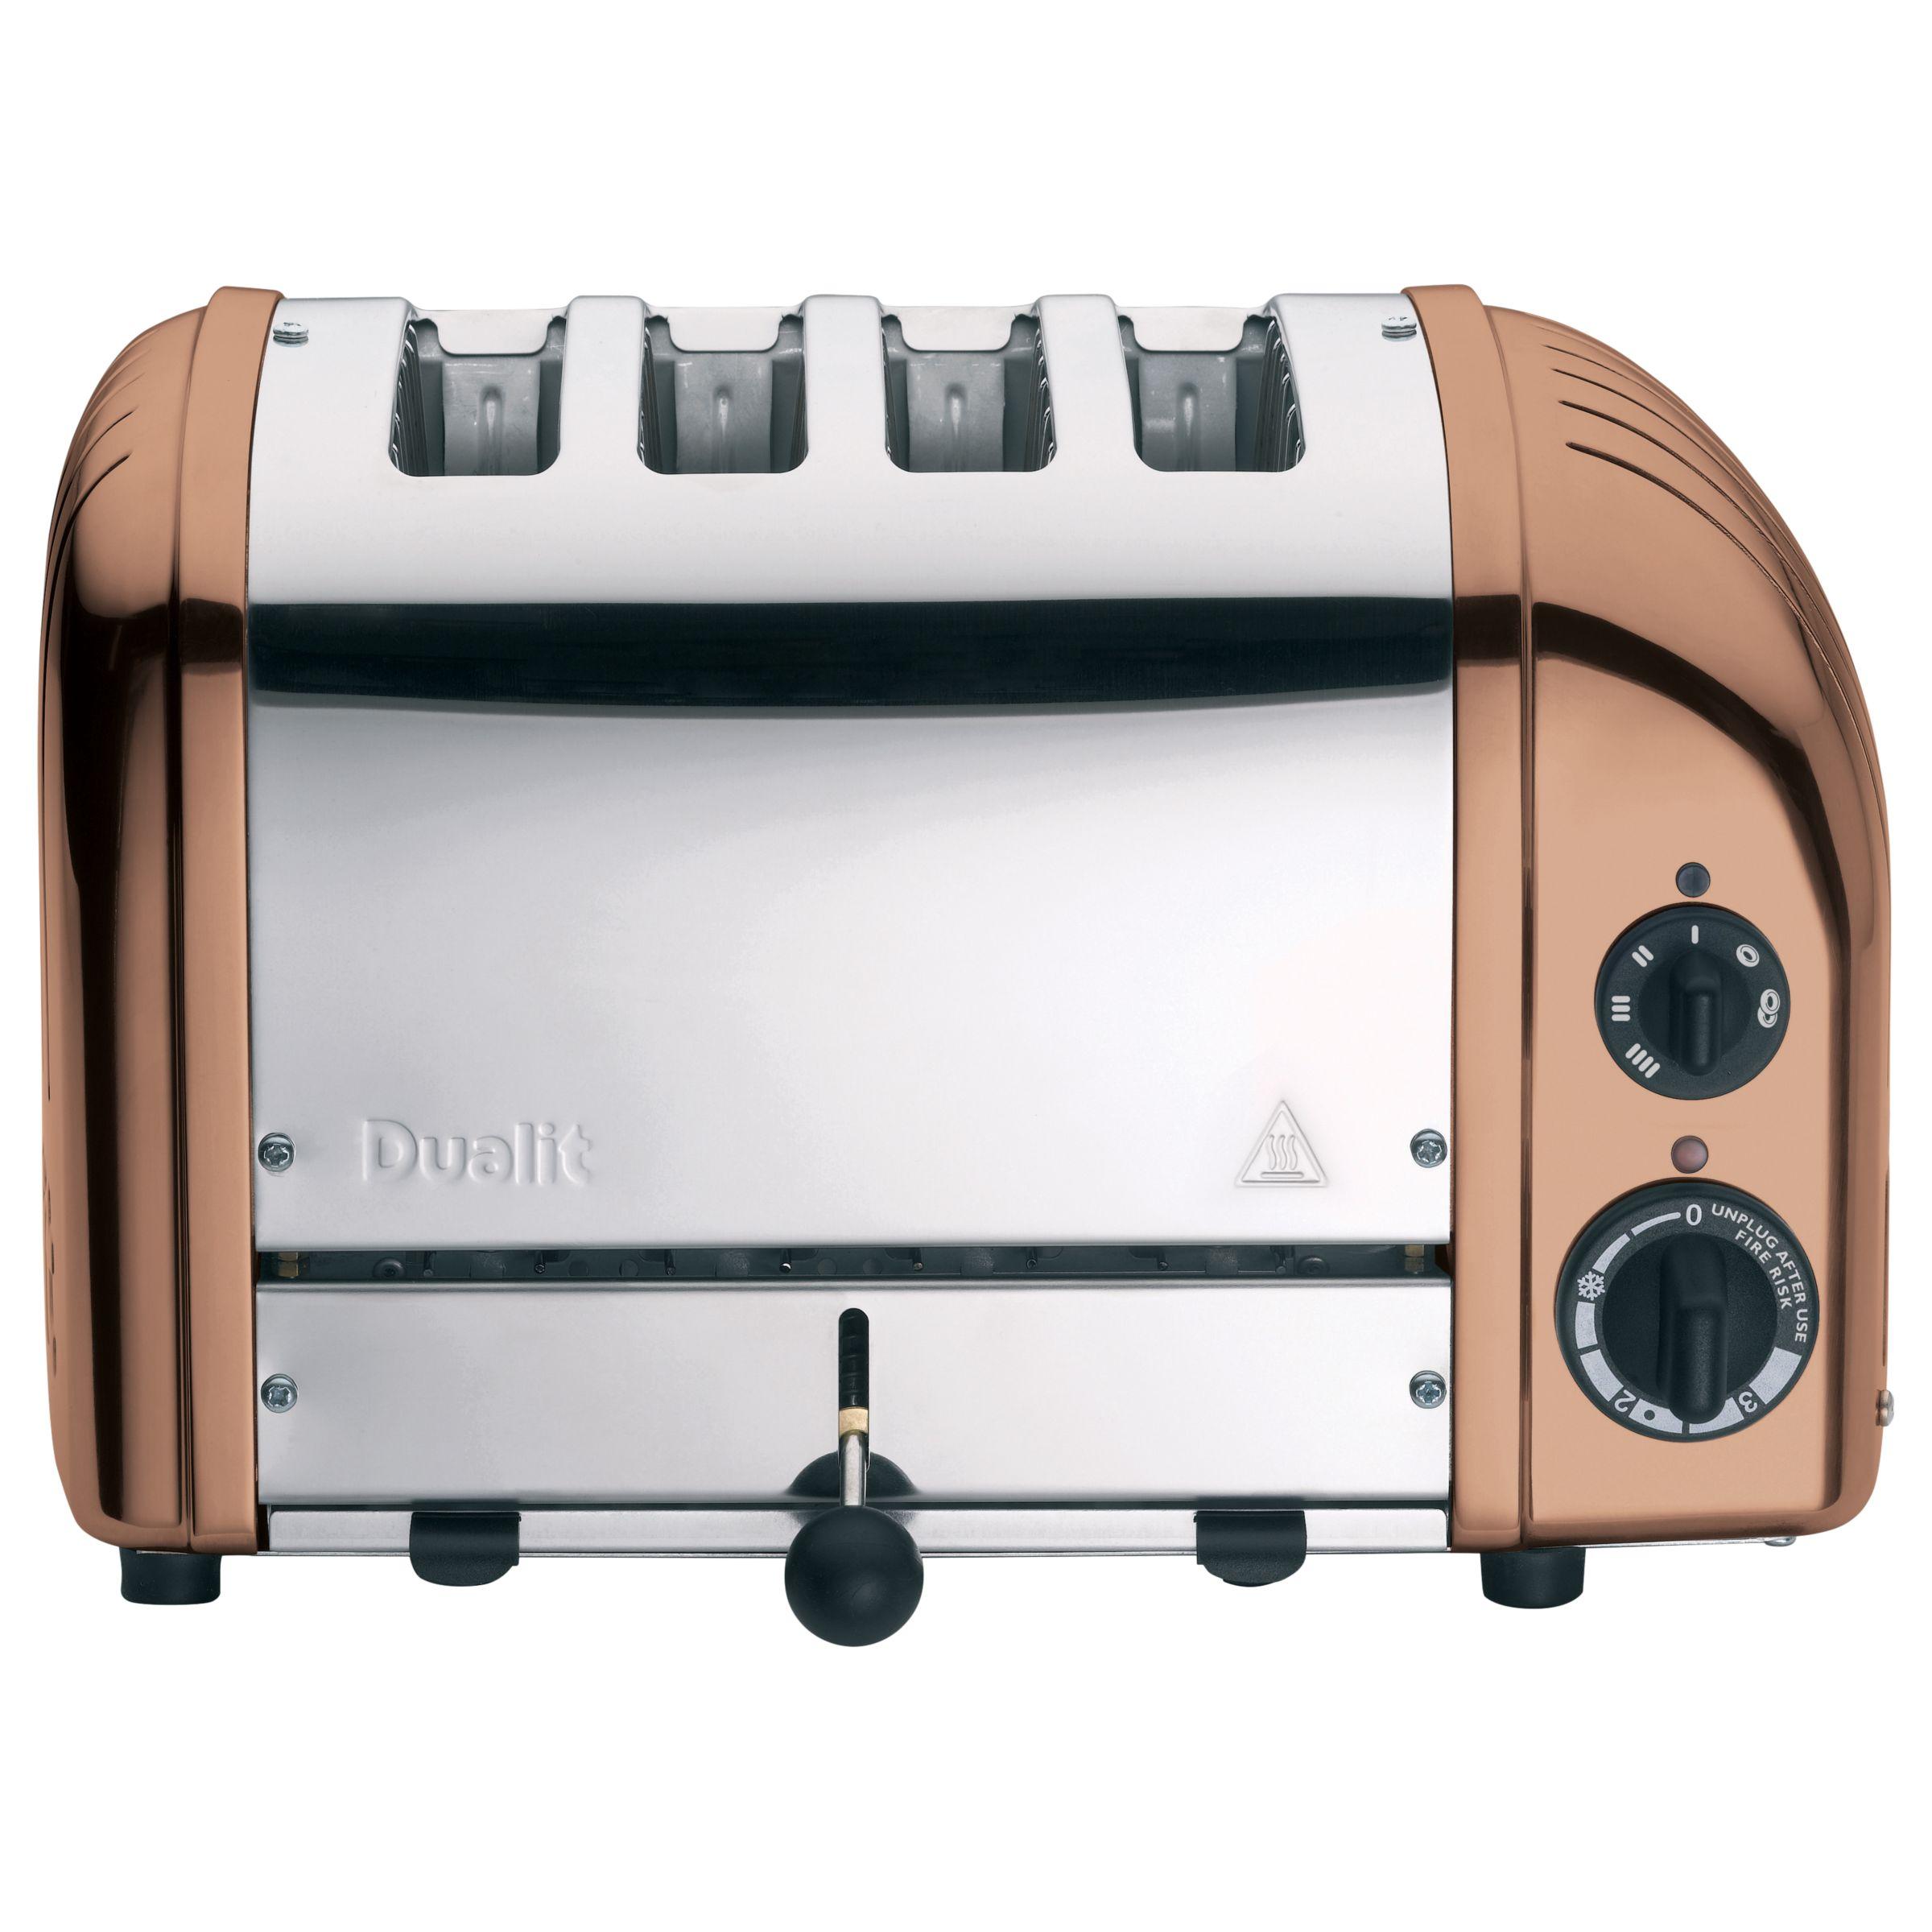 Dualit Dualit NewGen 4-Slice Toaster